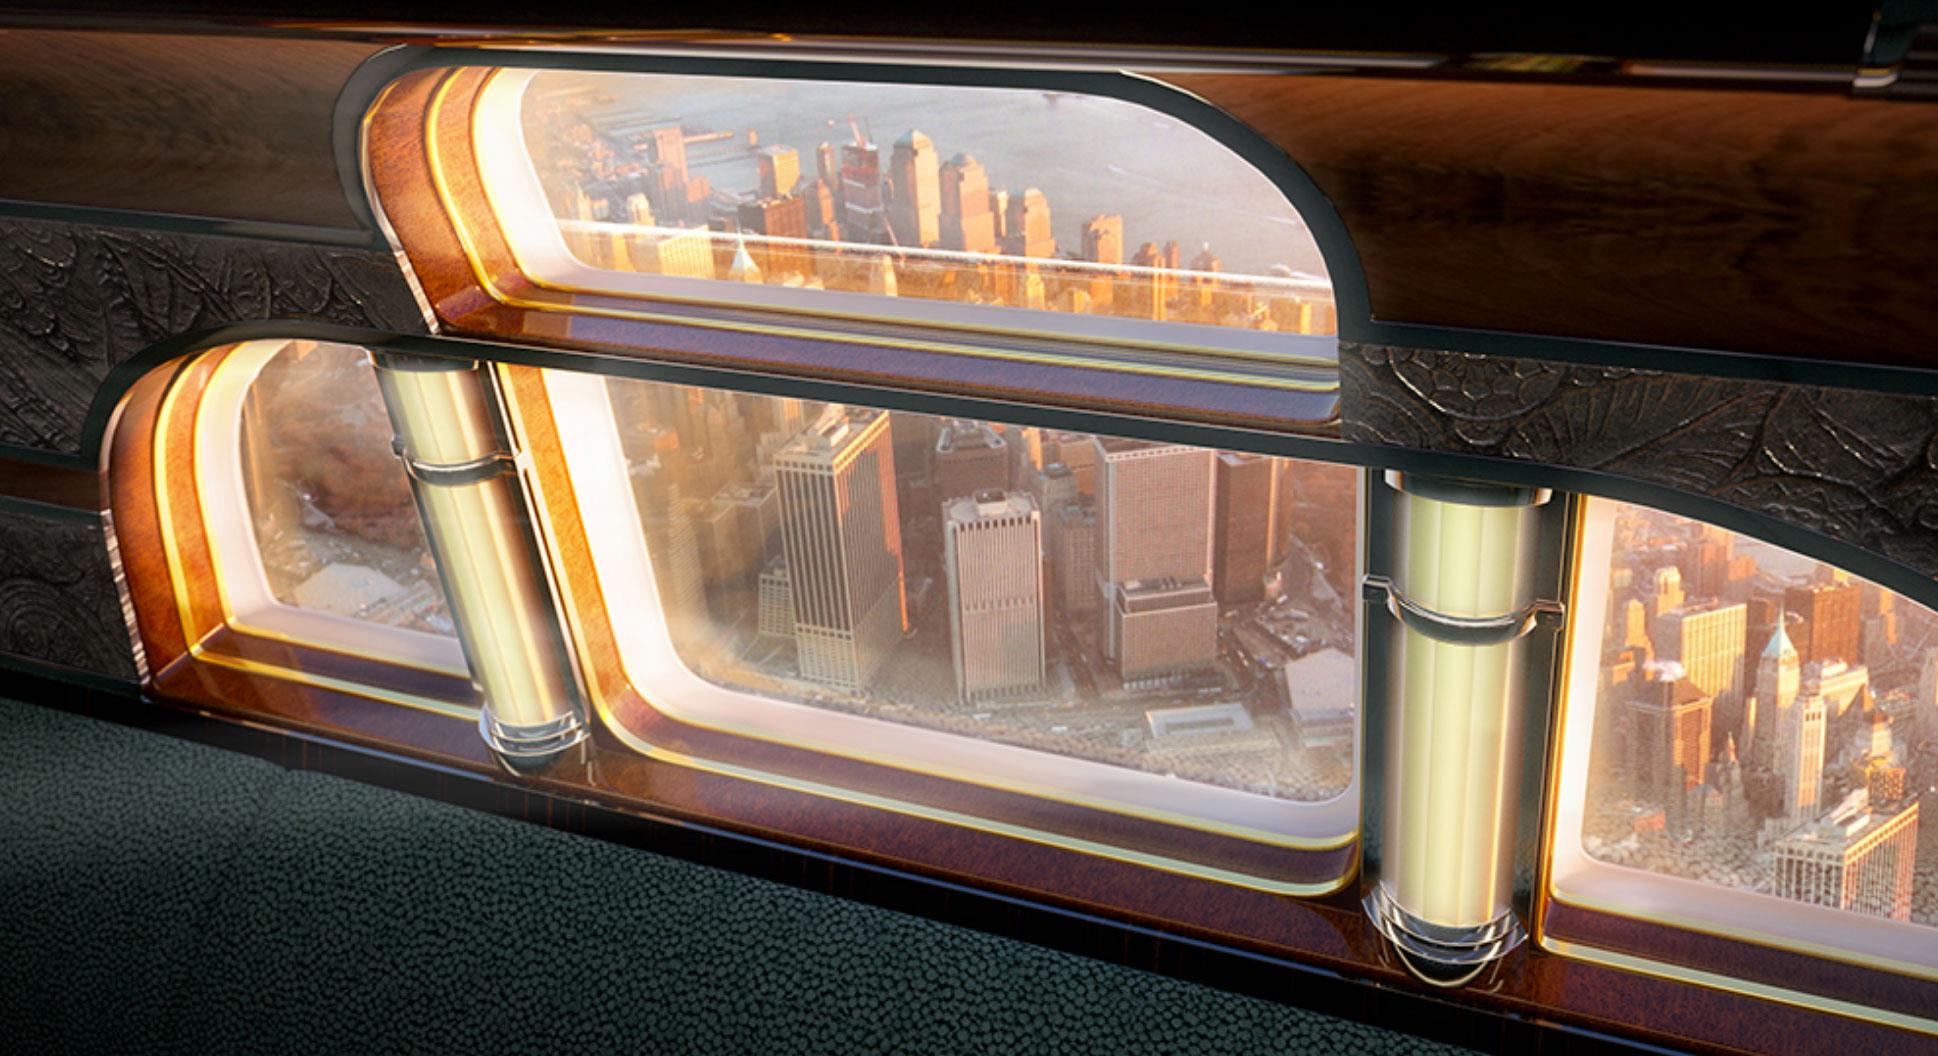 This Airplane Is Every Art Deco Aficionado's Dream